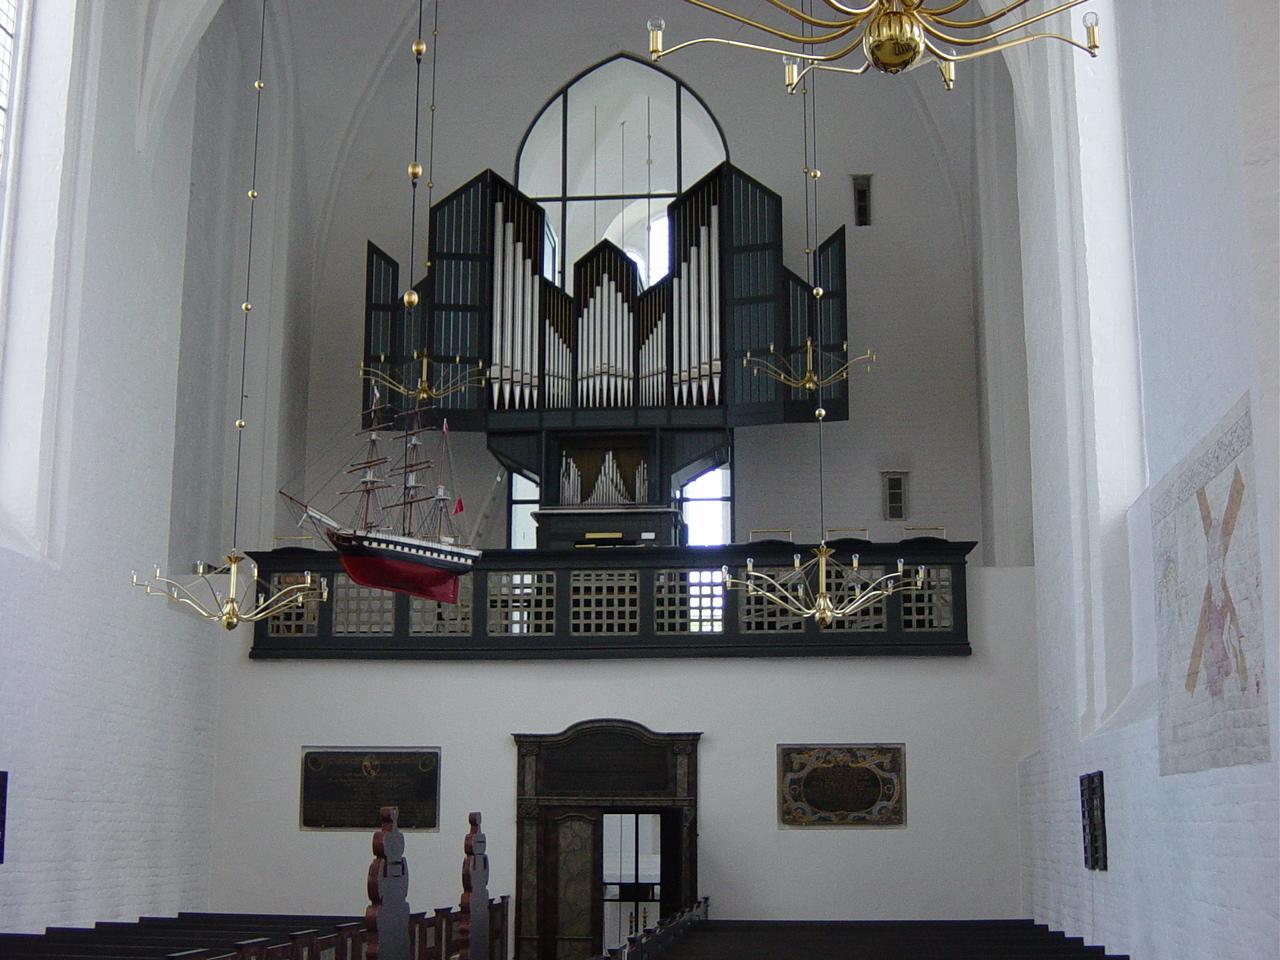 The old organ, Mariager, Denmark